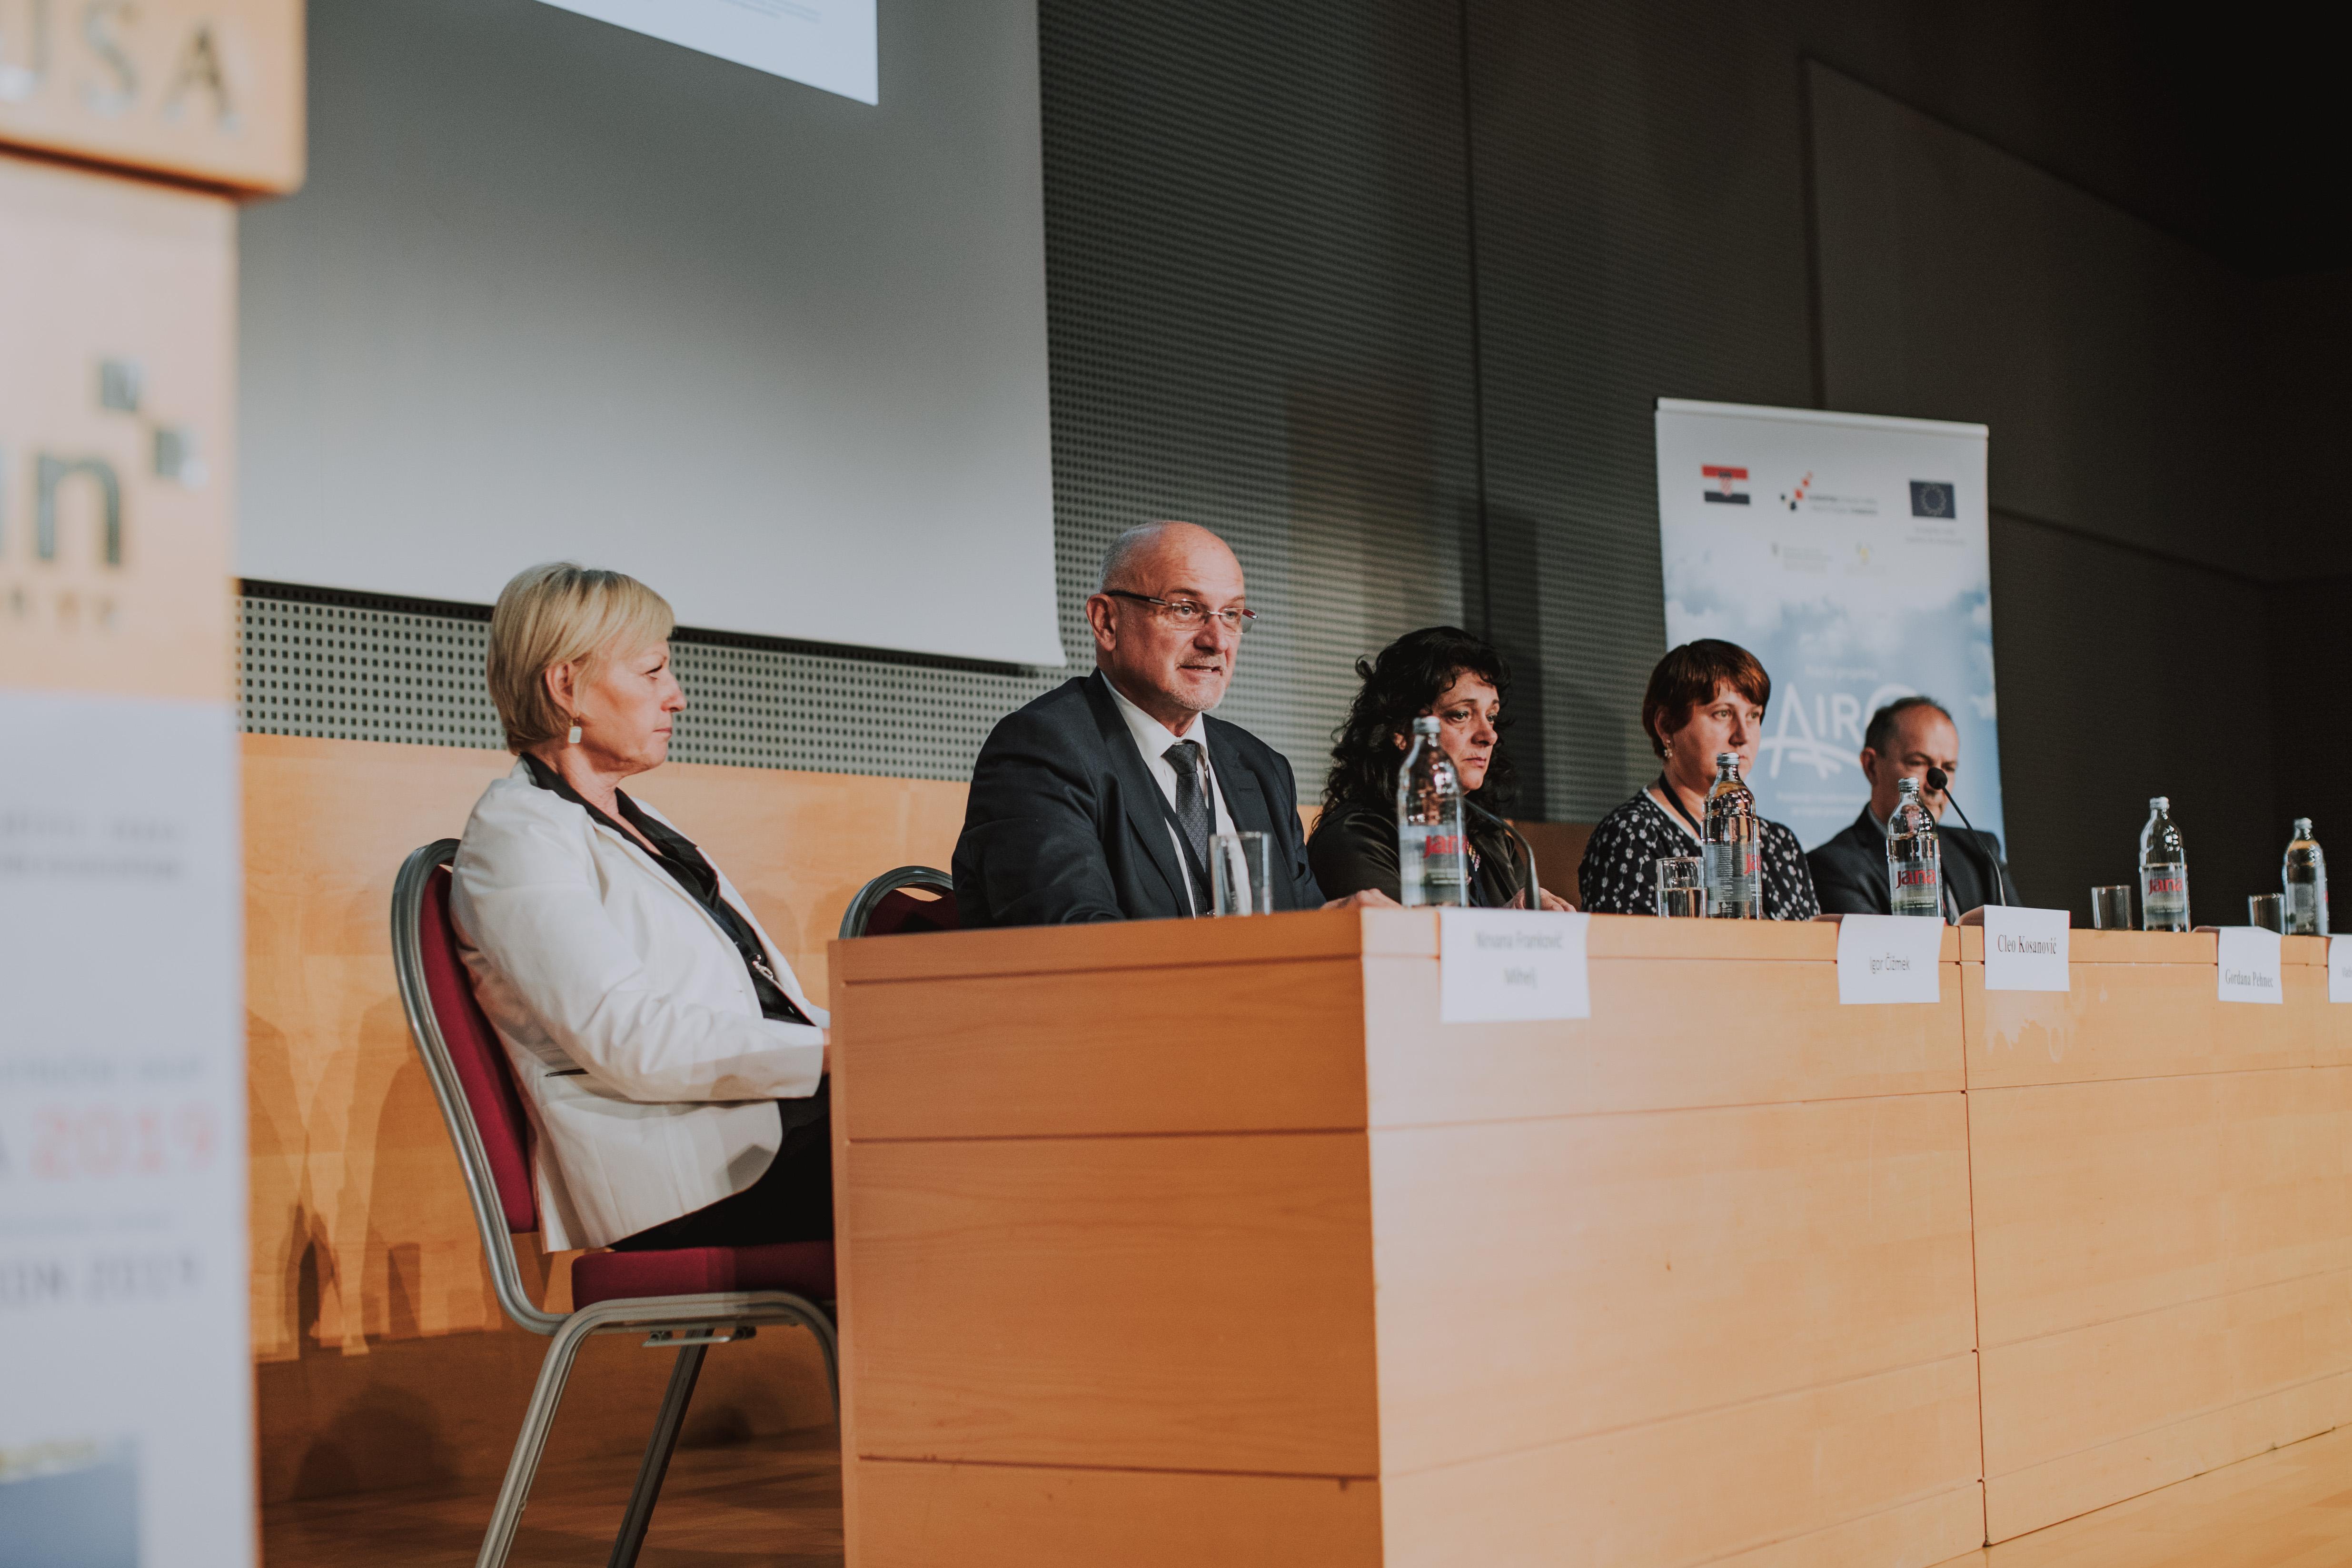 Nirvana Frankovic Mihelj, Igor Cizmek, Cleo Kosanovic, Gordana Pehnec, Vladimir Jelavic